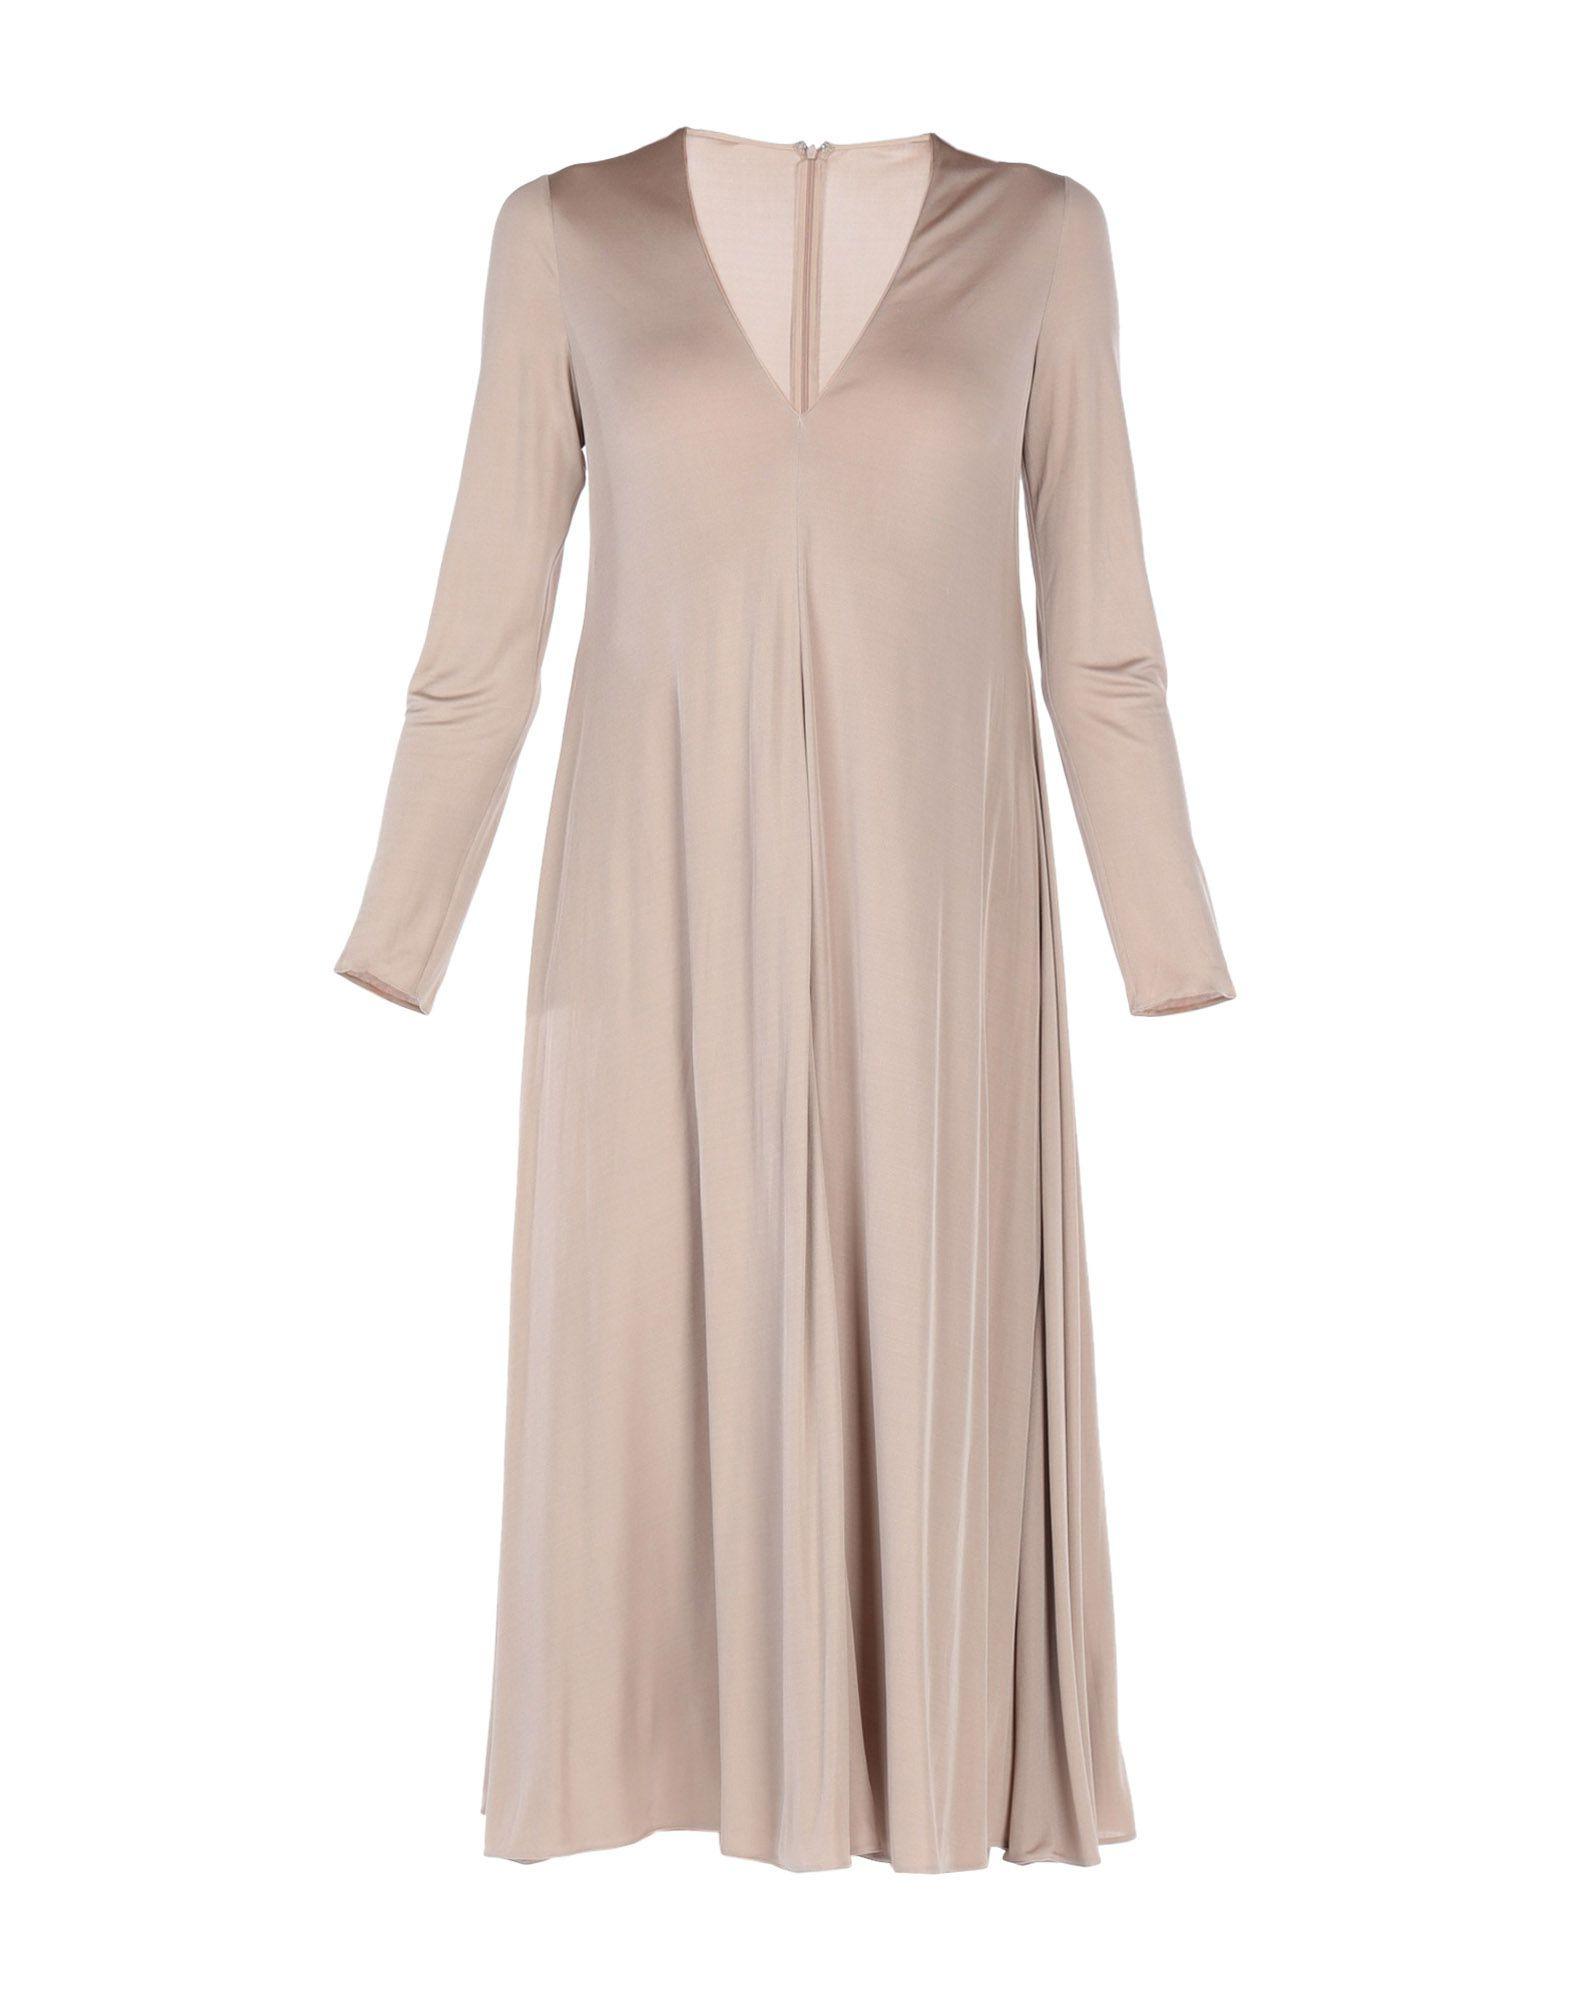 Abend Coolste Abendkleid Yoox Boutique10 Coolste Abendkleid Yoox Ärmel